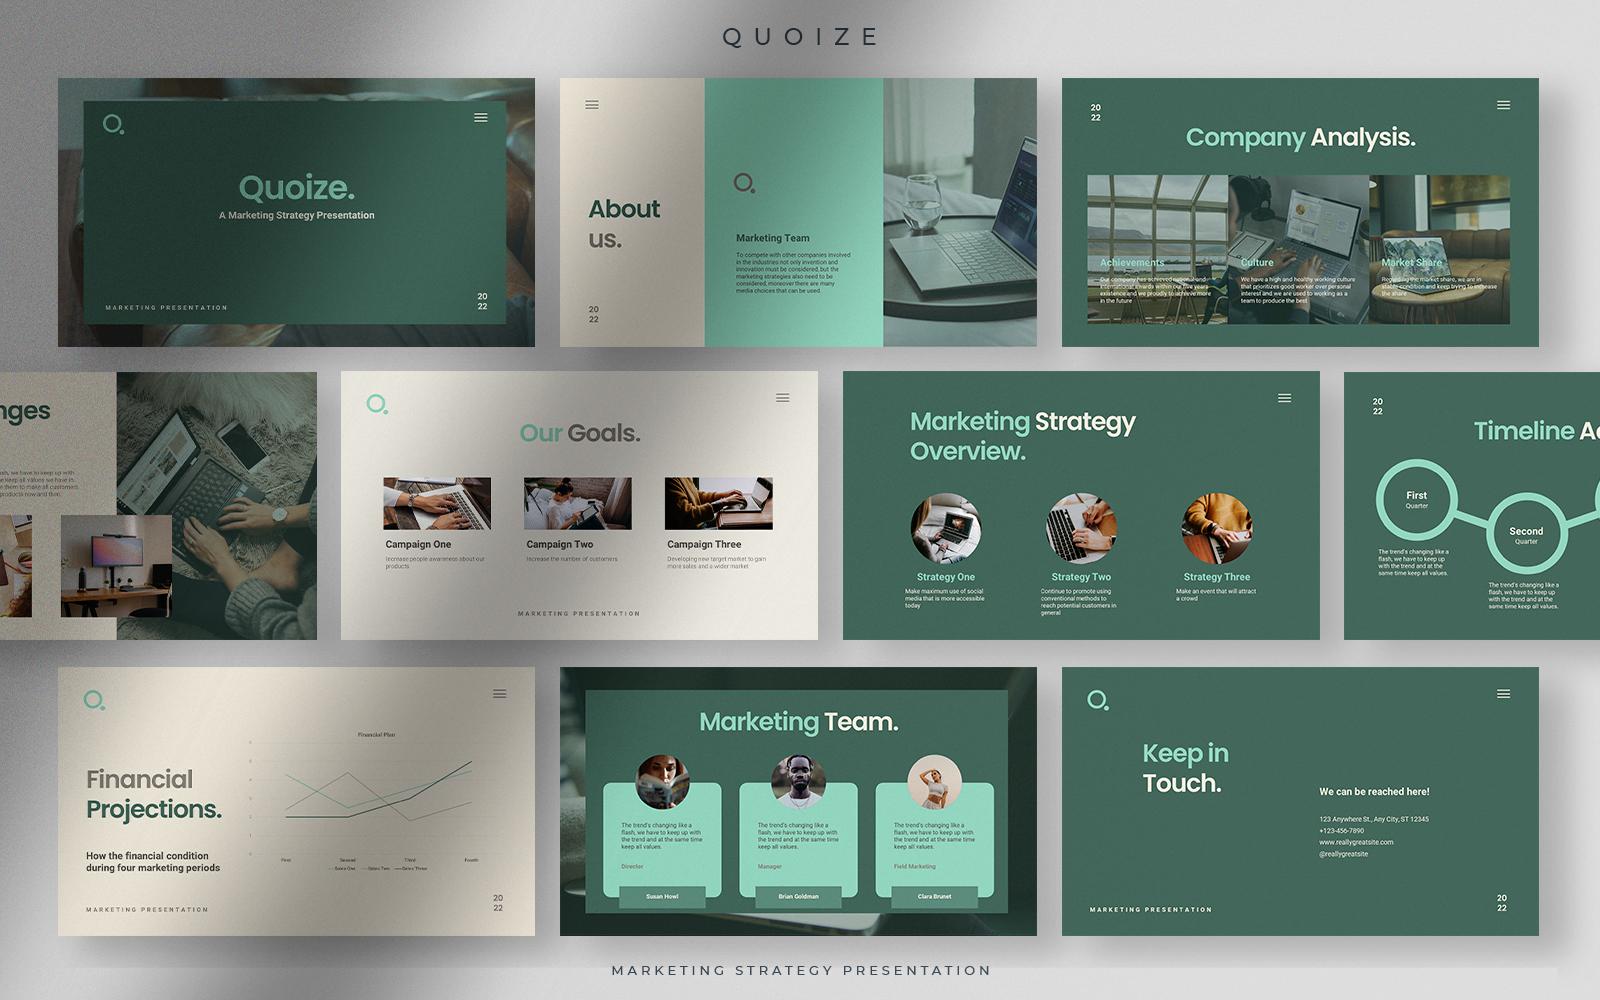 Quoize - Green Lake Marketing Strategy Presentation